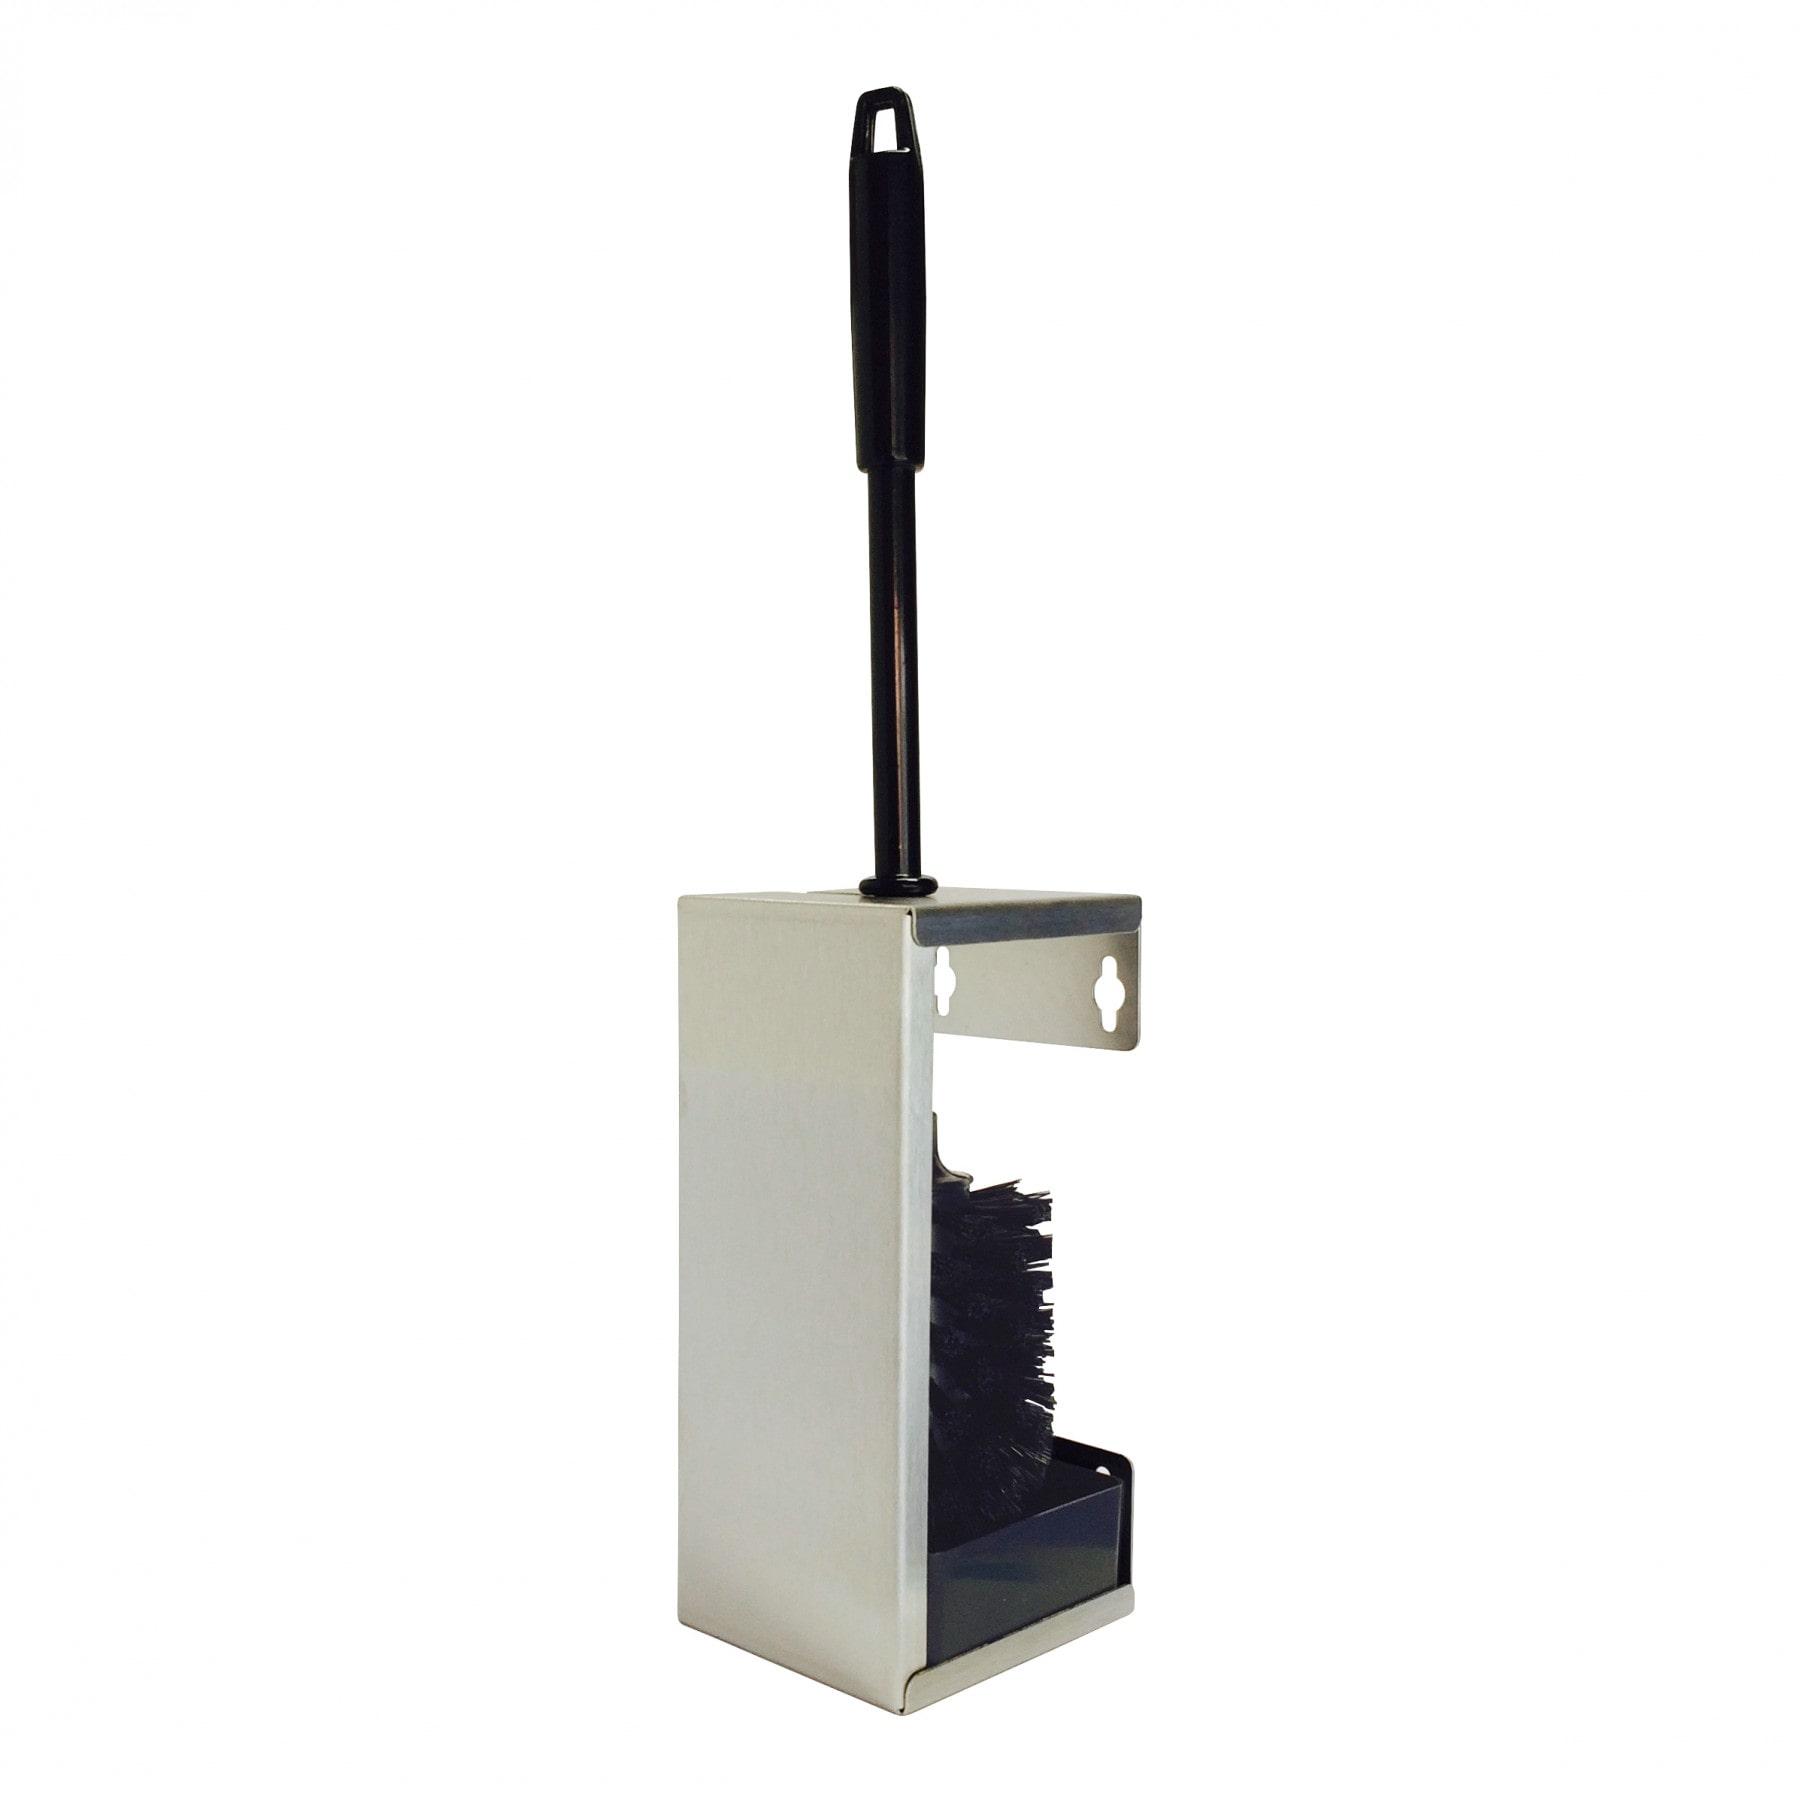 Santral | Toiletborstelhouder | RVS